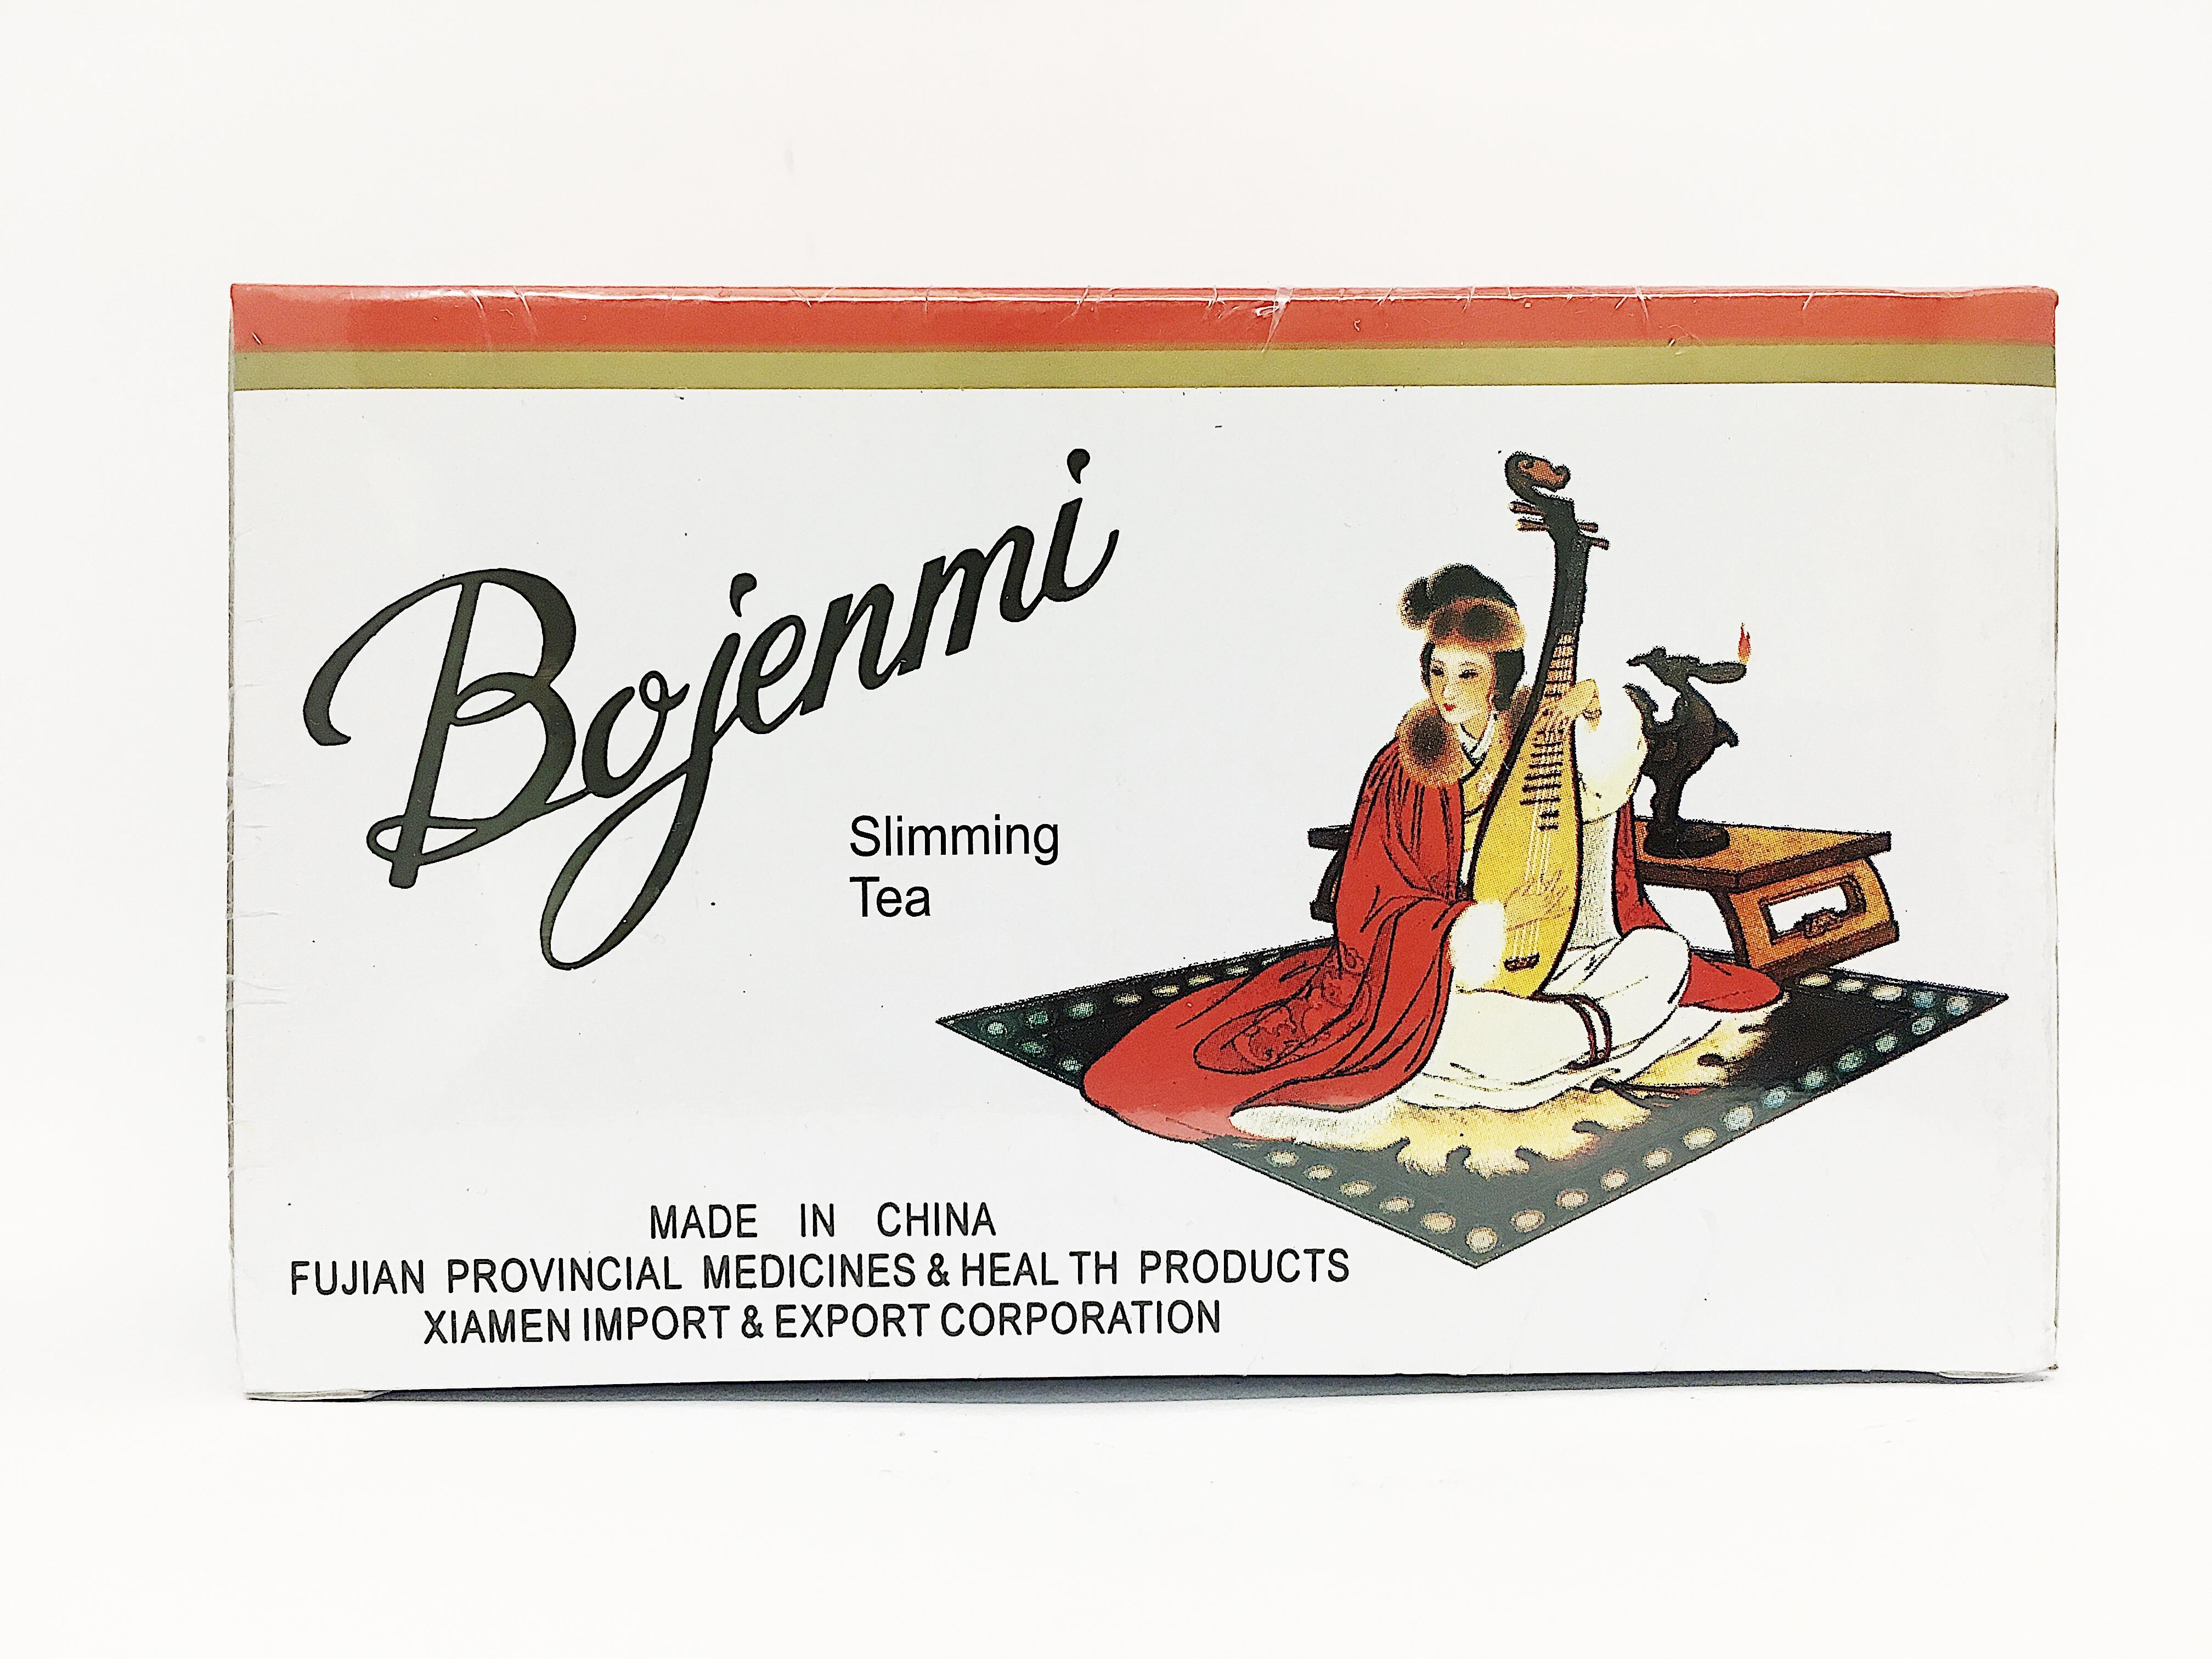 Bojenmi herbal tea - Bojenmi Slimming Tea 50g